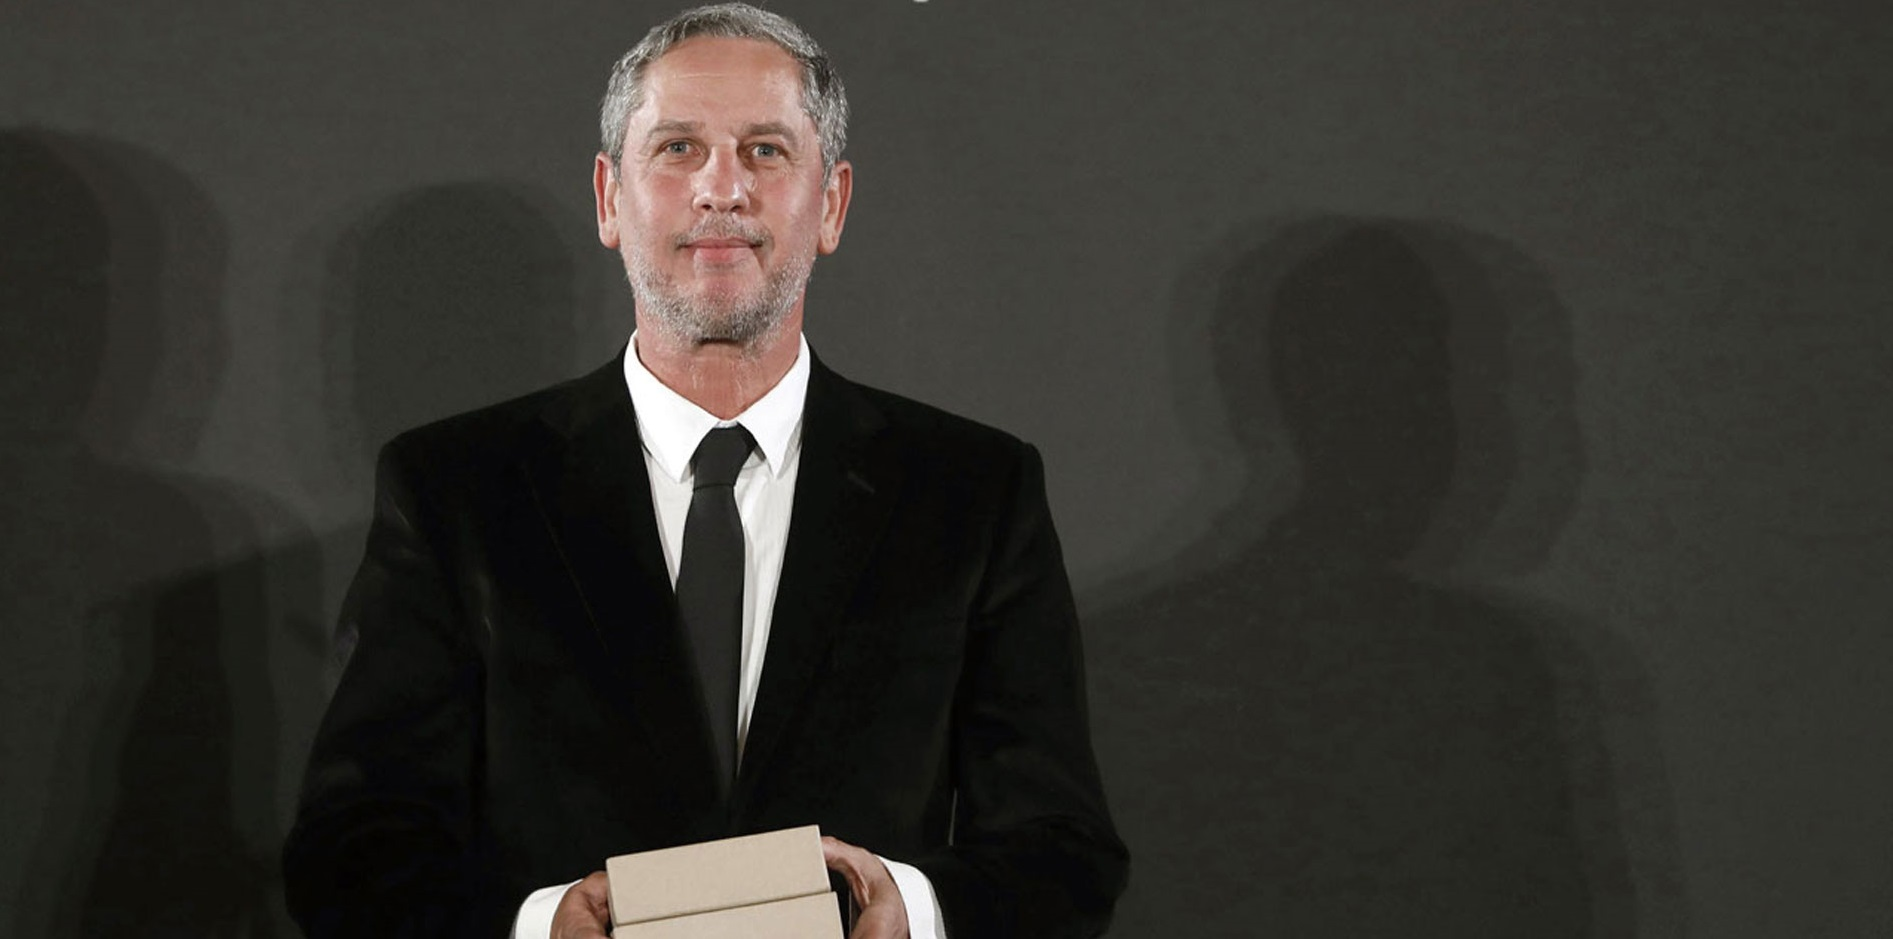 Guillermo Martínez, Premio Nadal de Novela 2019.